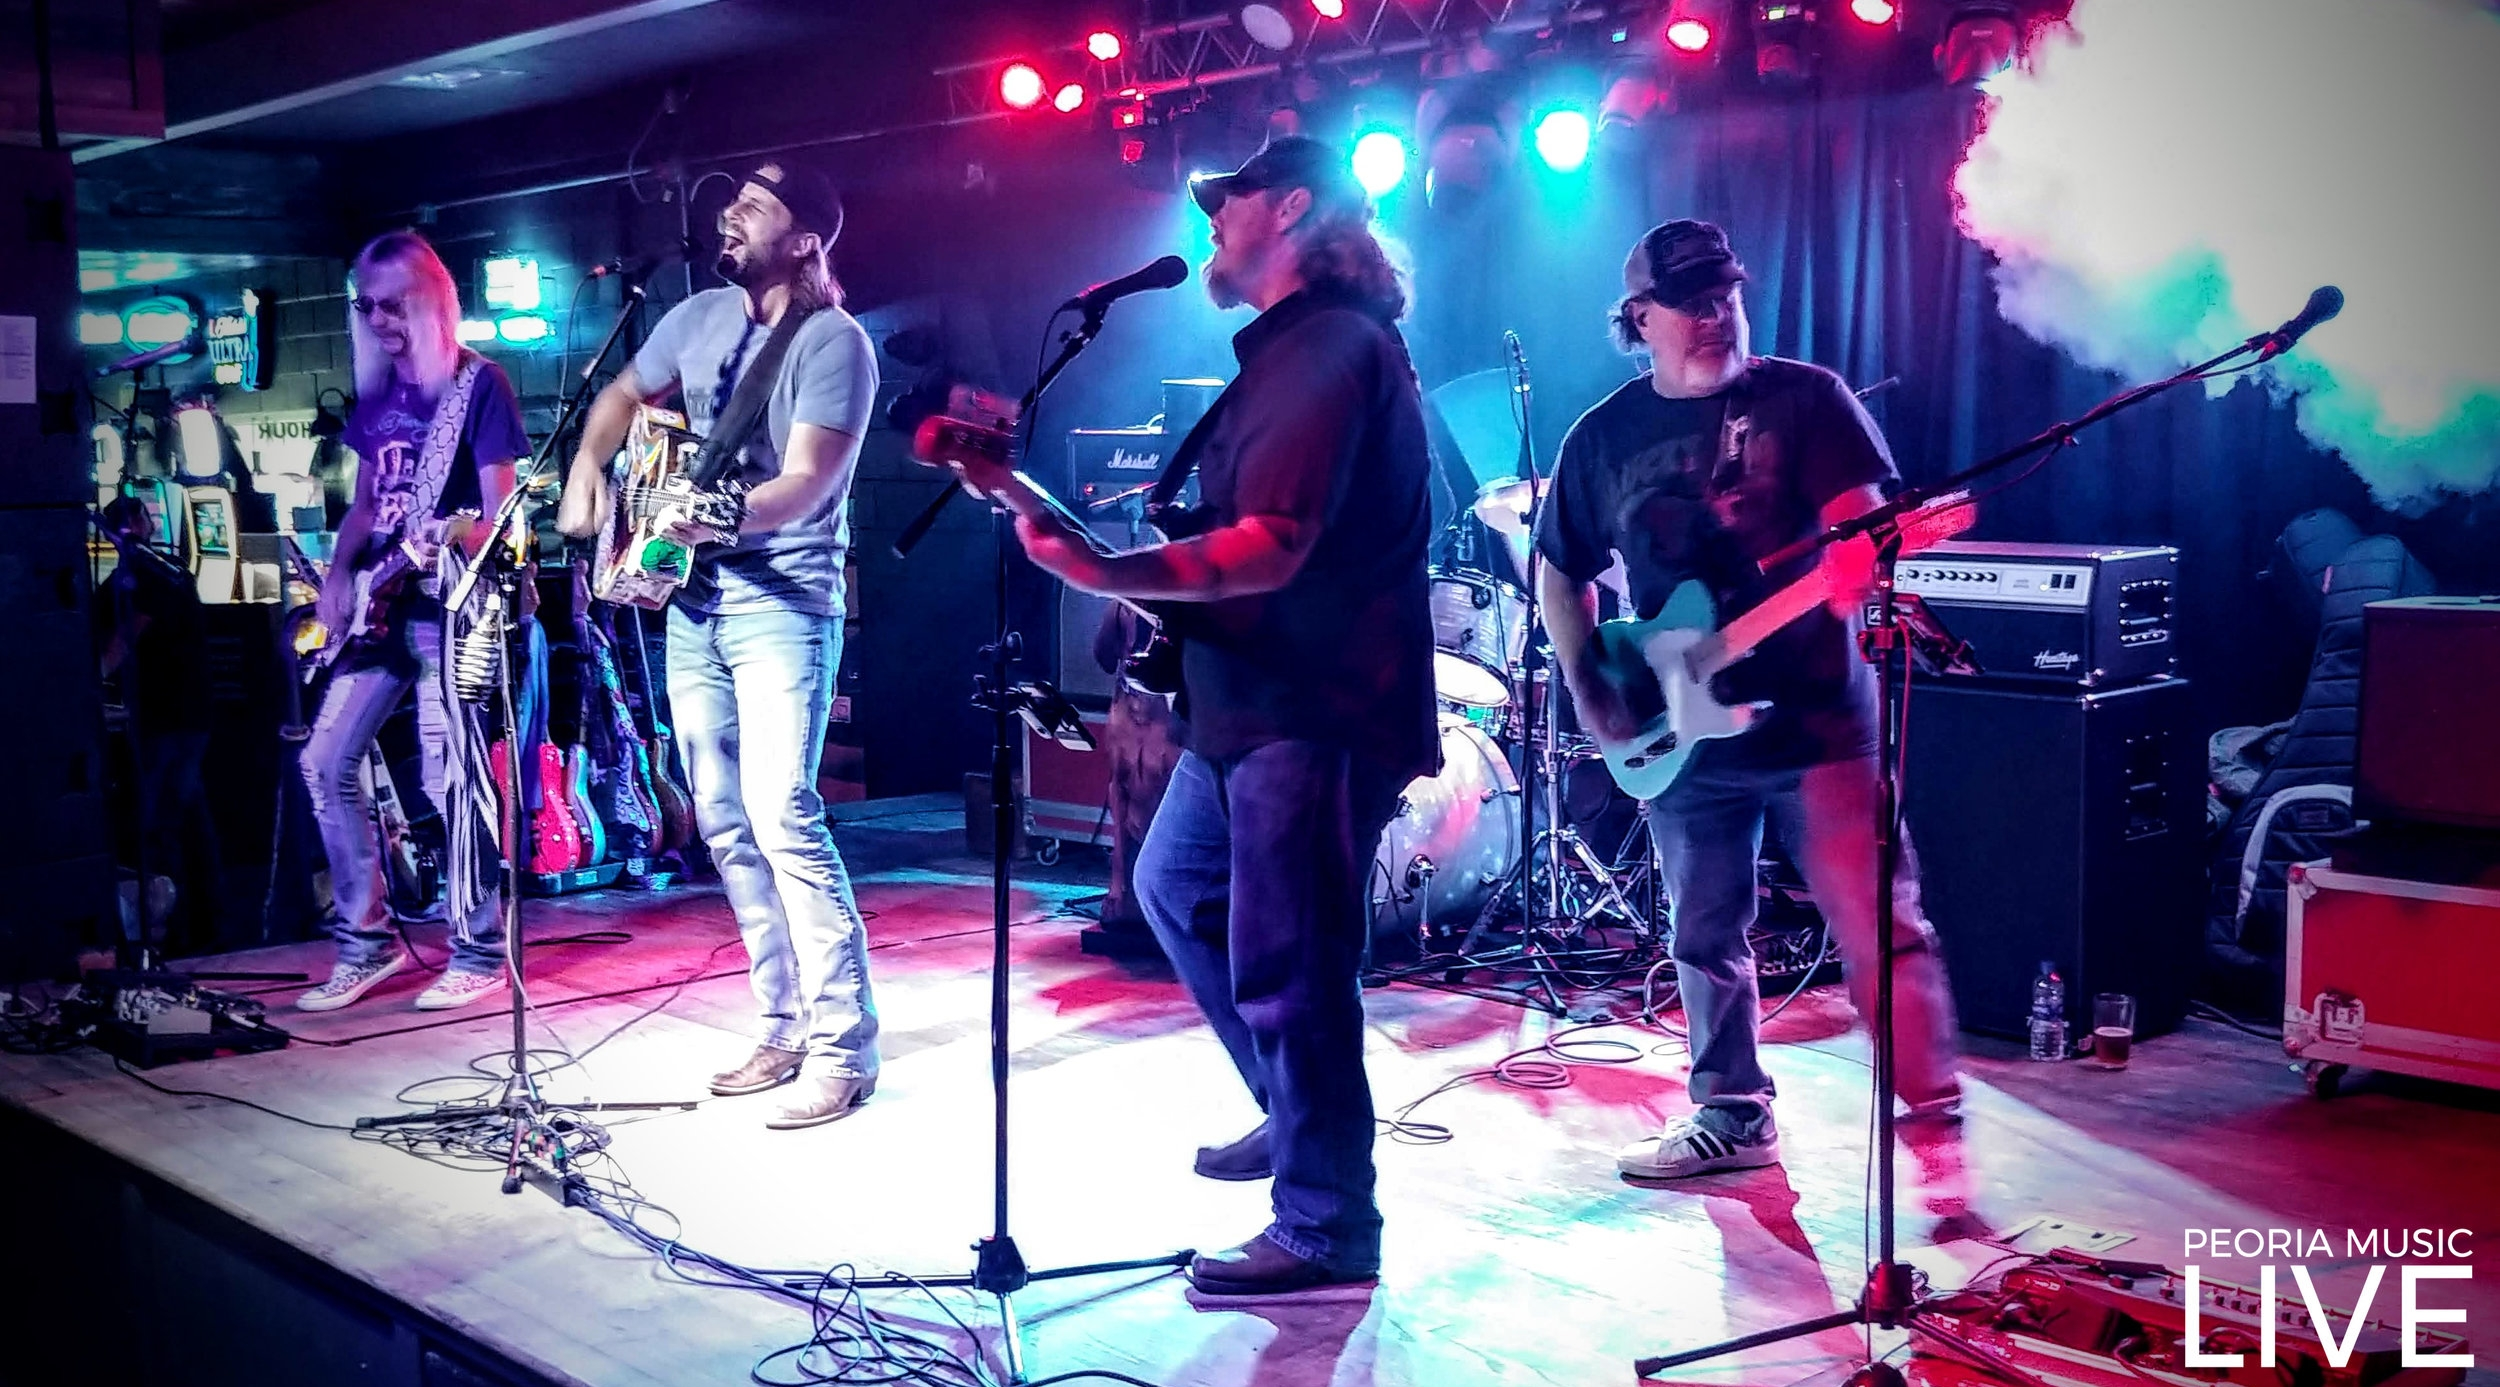 Joe Stamm Band at Crusen's on Farmington 8/25/18